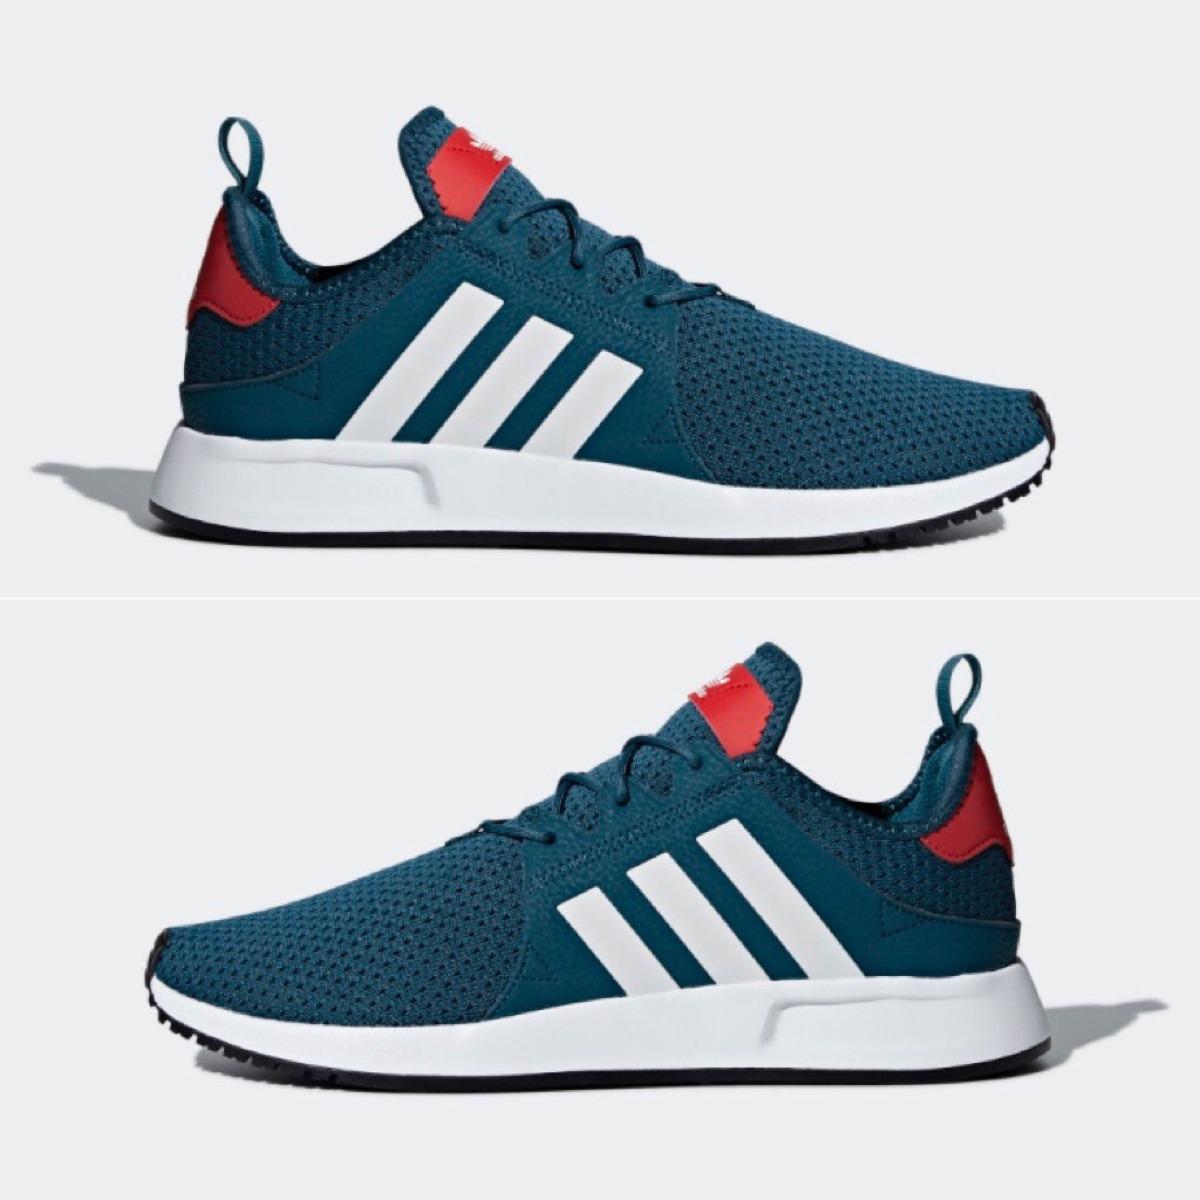 plr Mx Orig Azul Caja 8 Envió 5 Tenis Y Adidas X 5 5 qBwn1ER